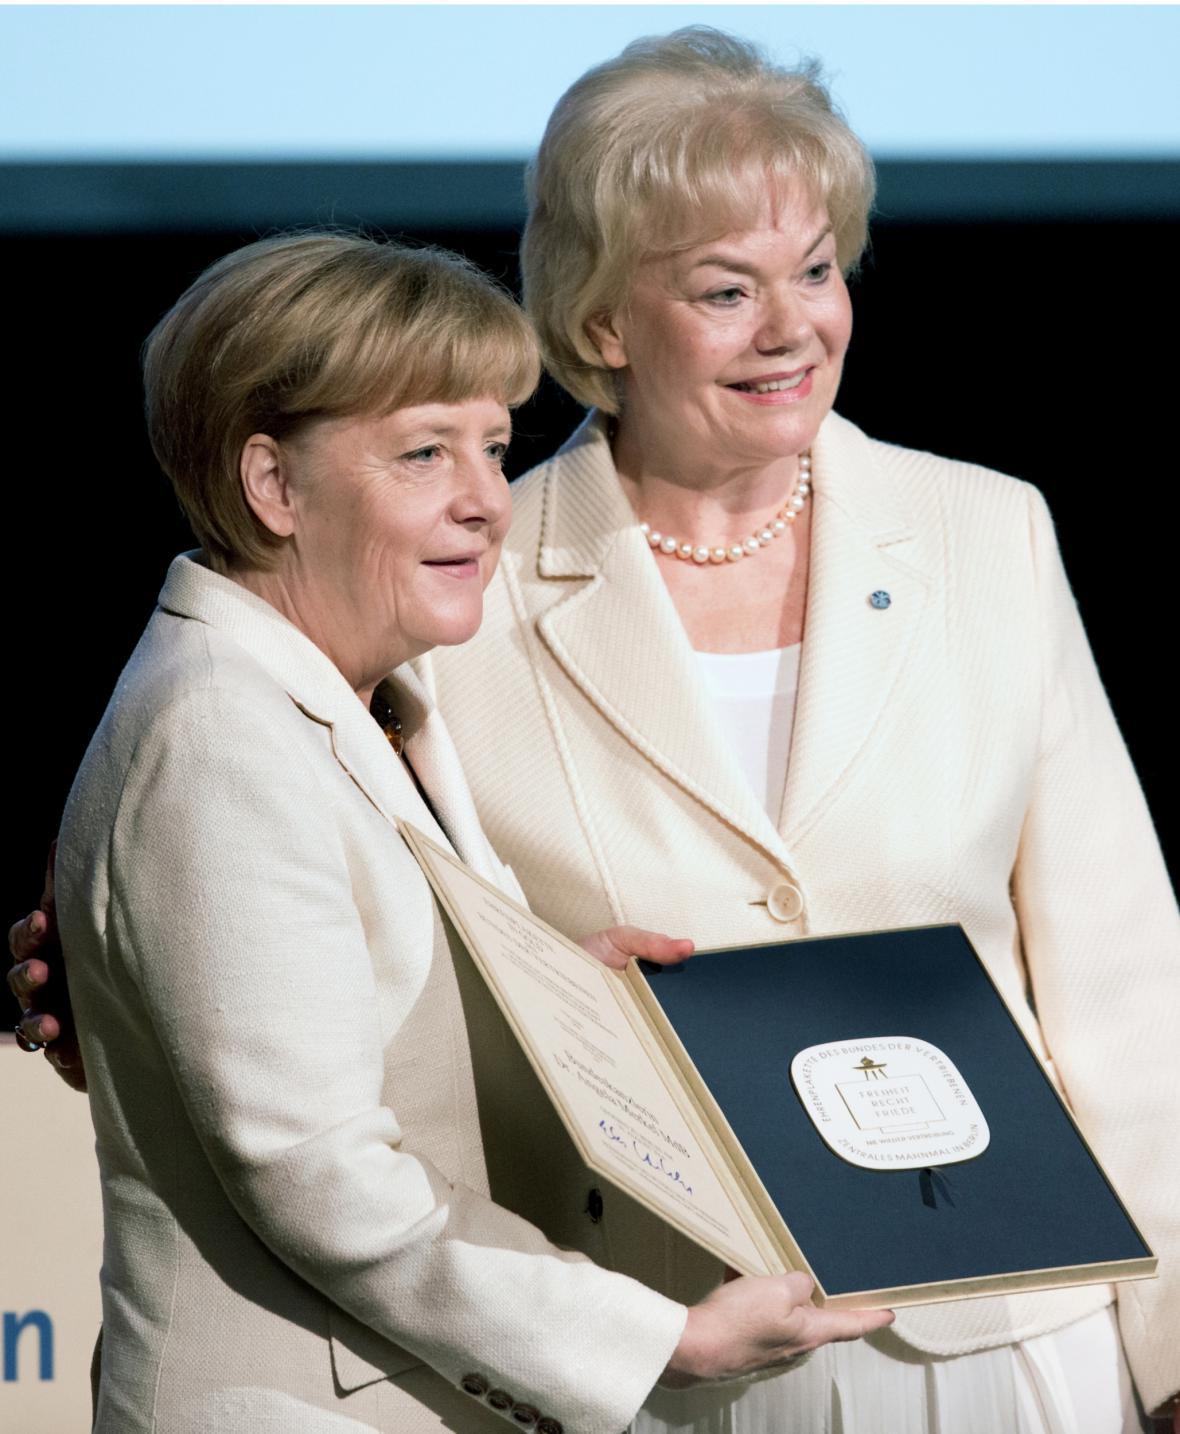 Svaz vyhnanců ocenil Merkelovou